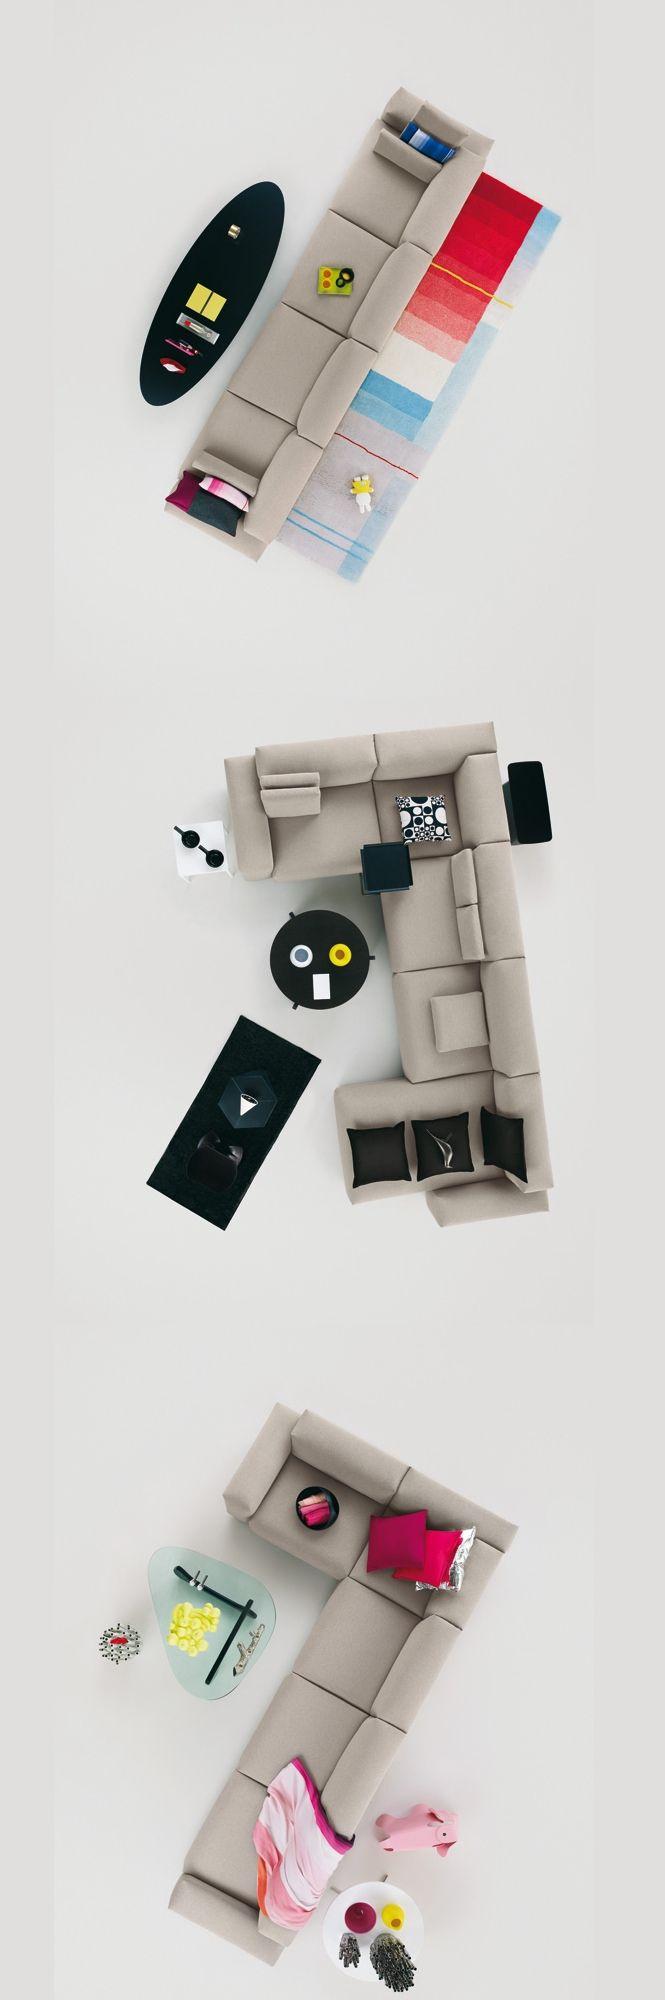 Modern Grey Modular Sofa Black Stand Lamp Glass Table Black Table Living Room Pink Pillow: Modern Sofa Design for our Living Room...